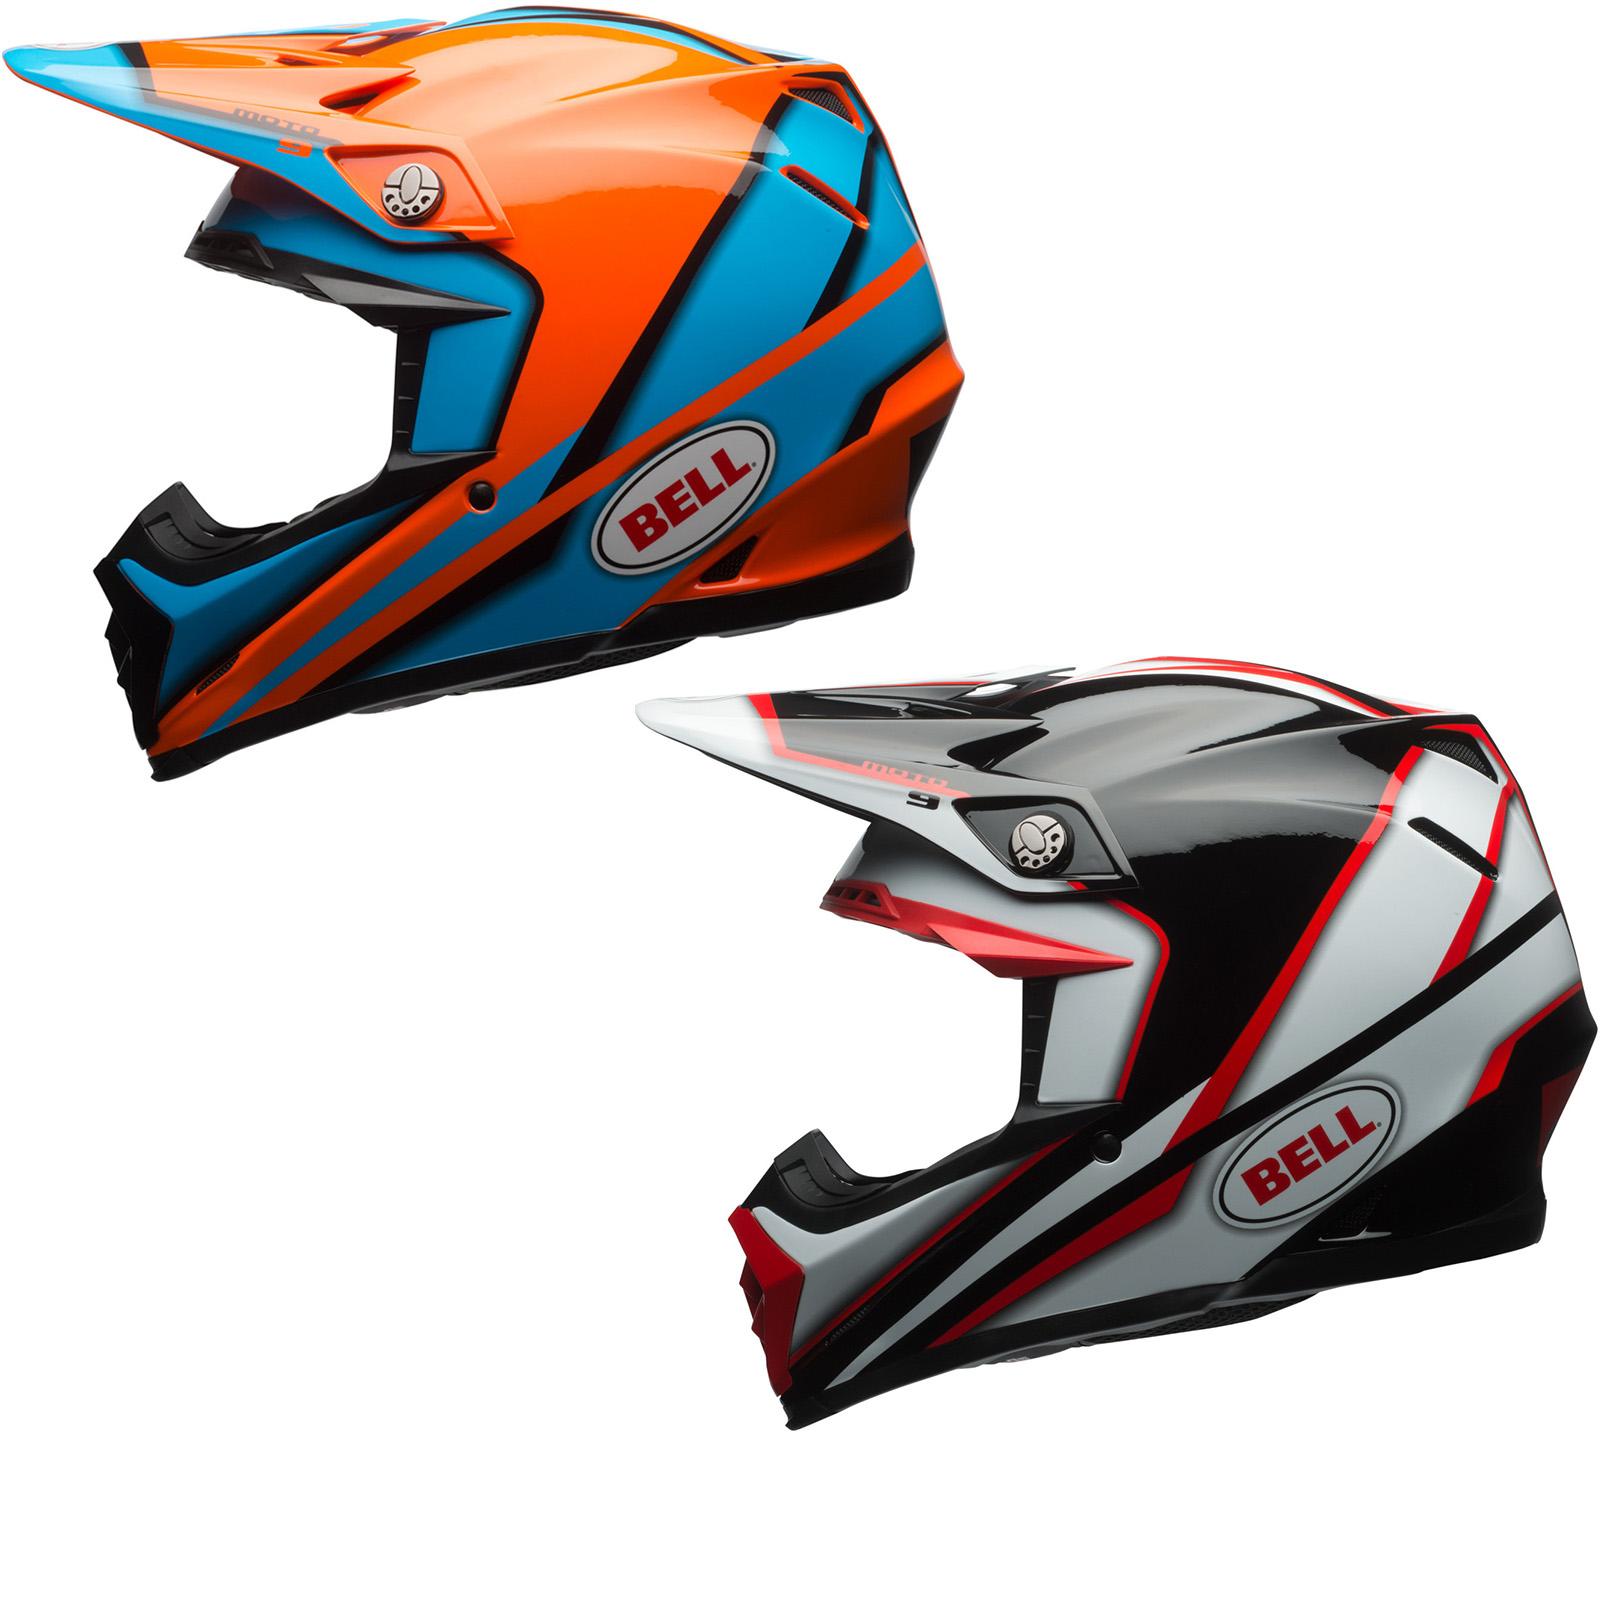 bell moto 9 spark motocross helmet new arrivals. Black Bedroom Furniture Sets. Home Design Ideas